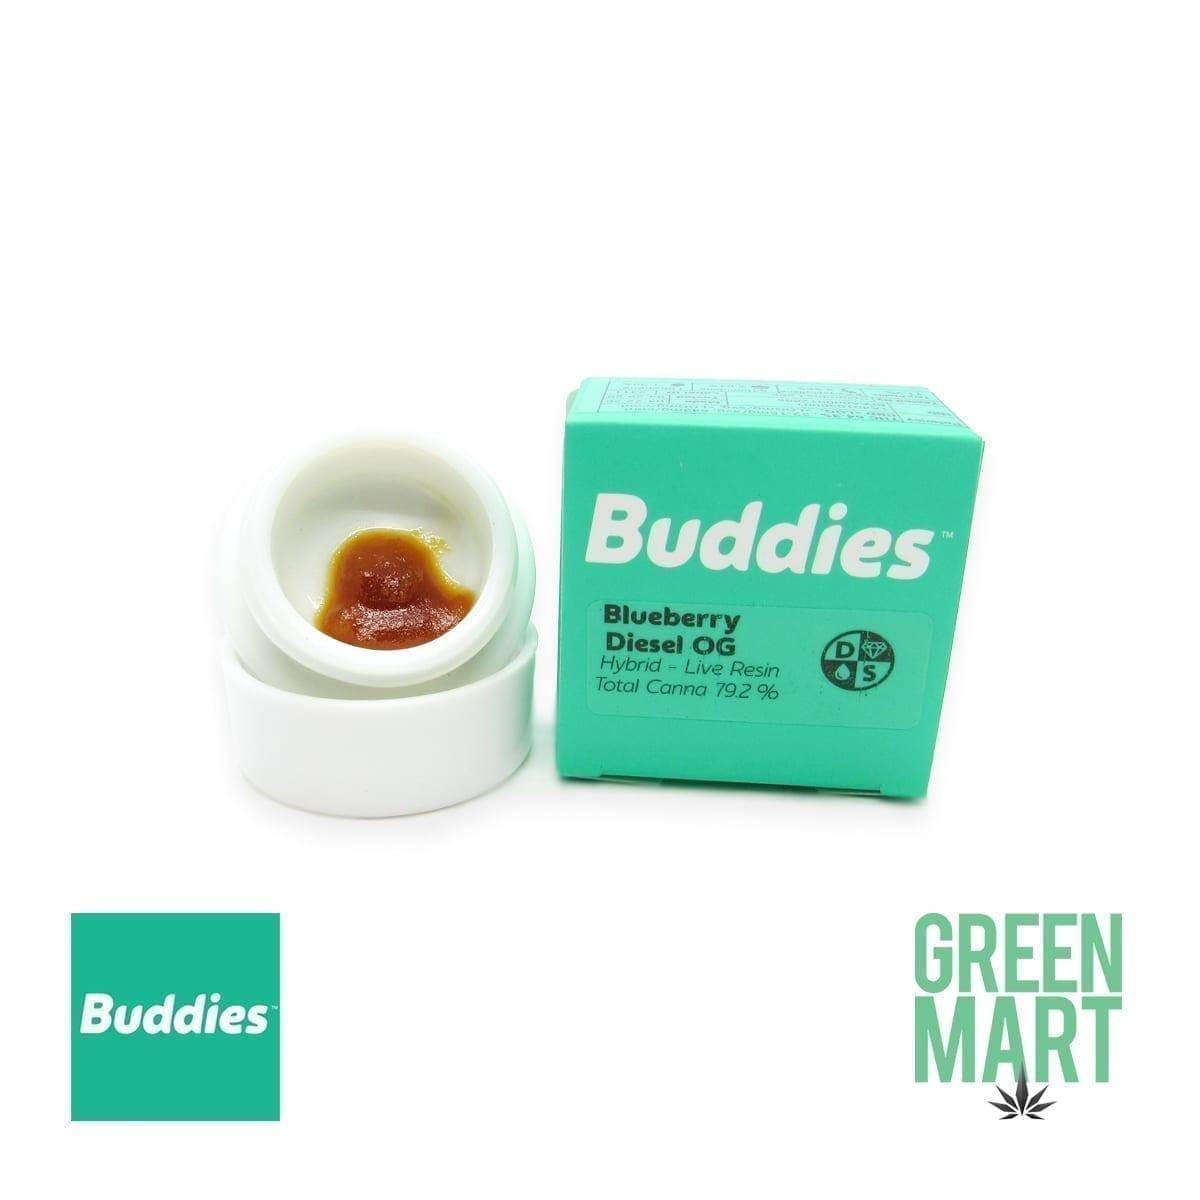 Buddies Dab - Blueberry Diesel OG